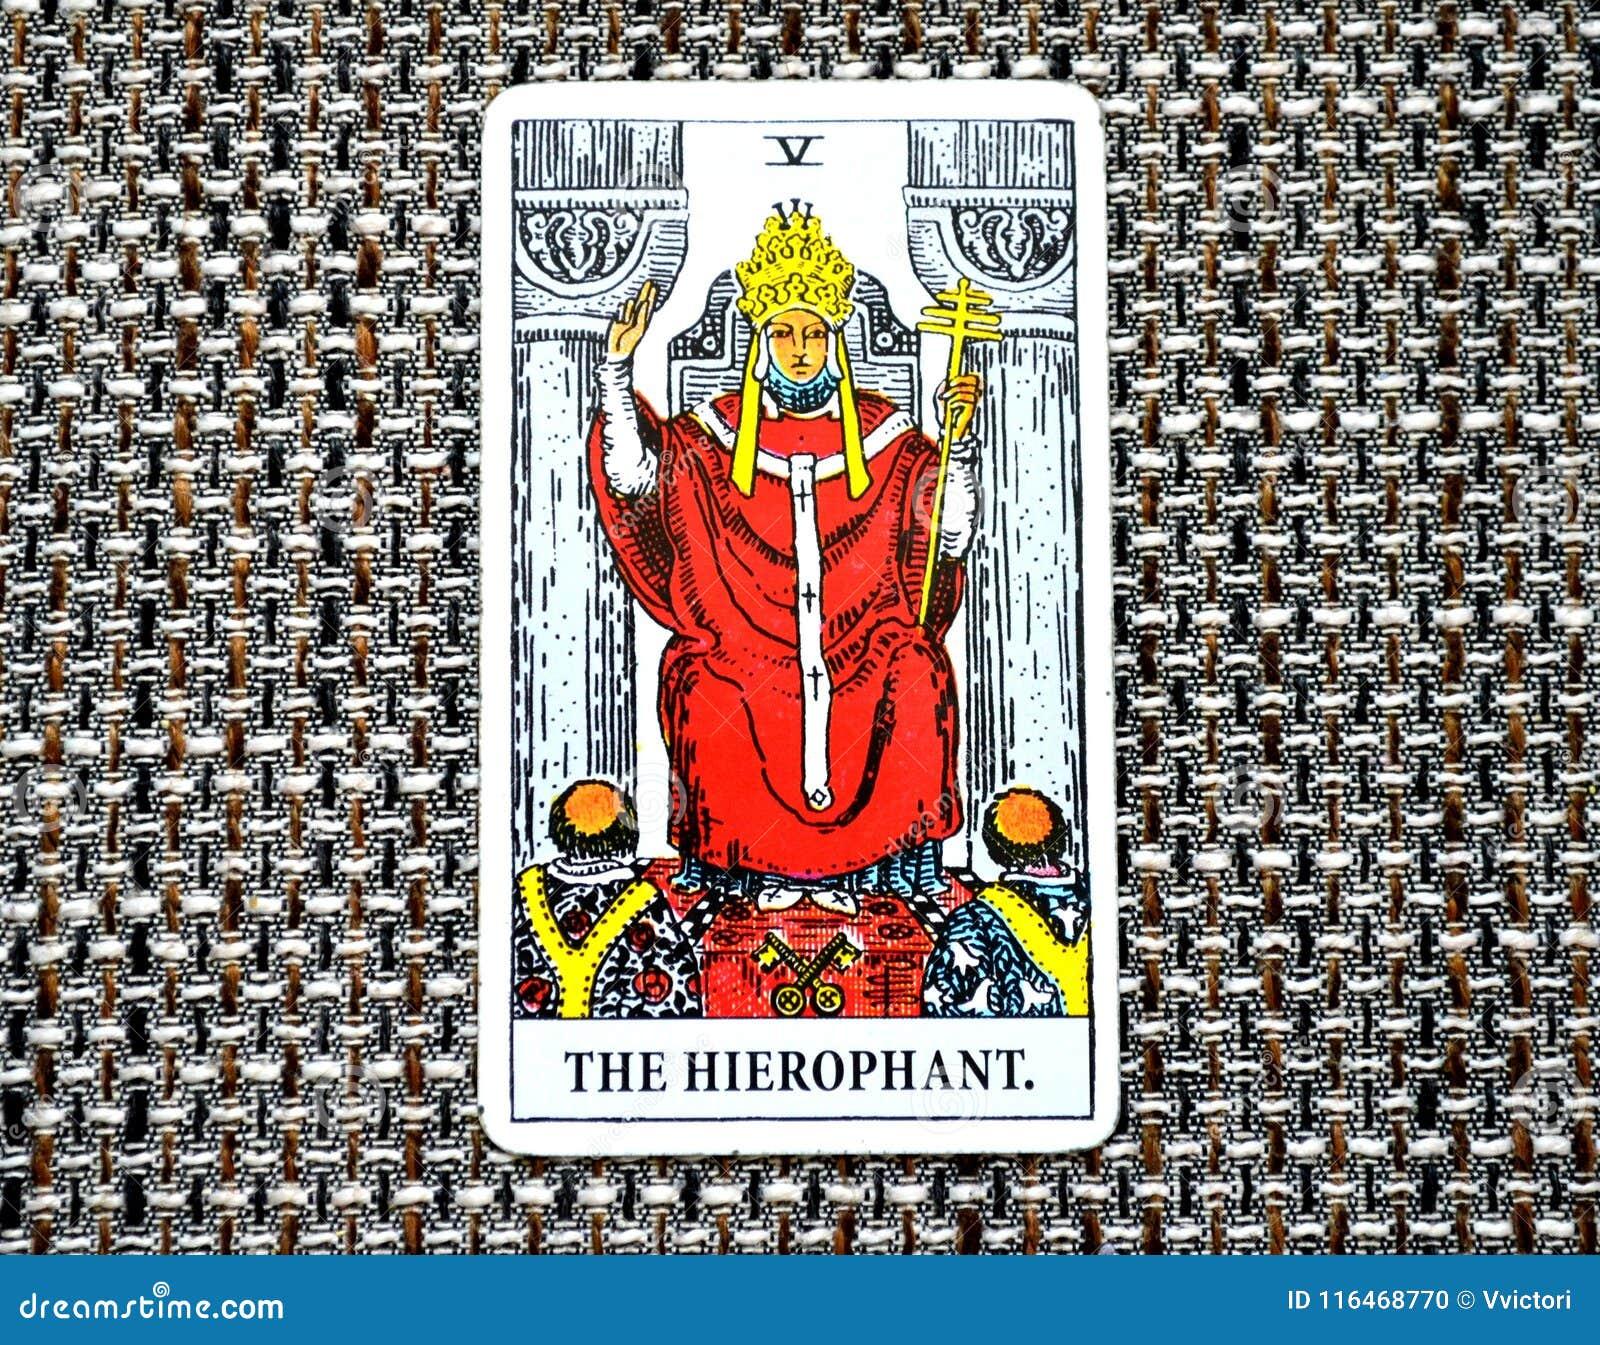 Le ccult de Guru de tradition d éducation d établissements de carte de tarot de Hierophant